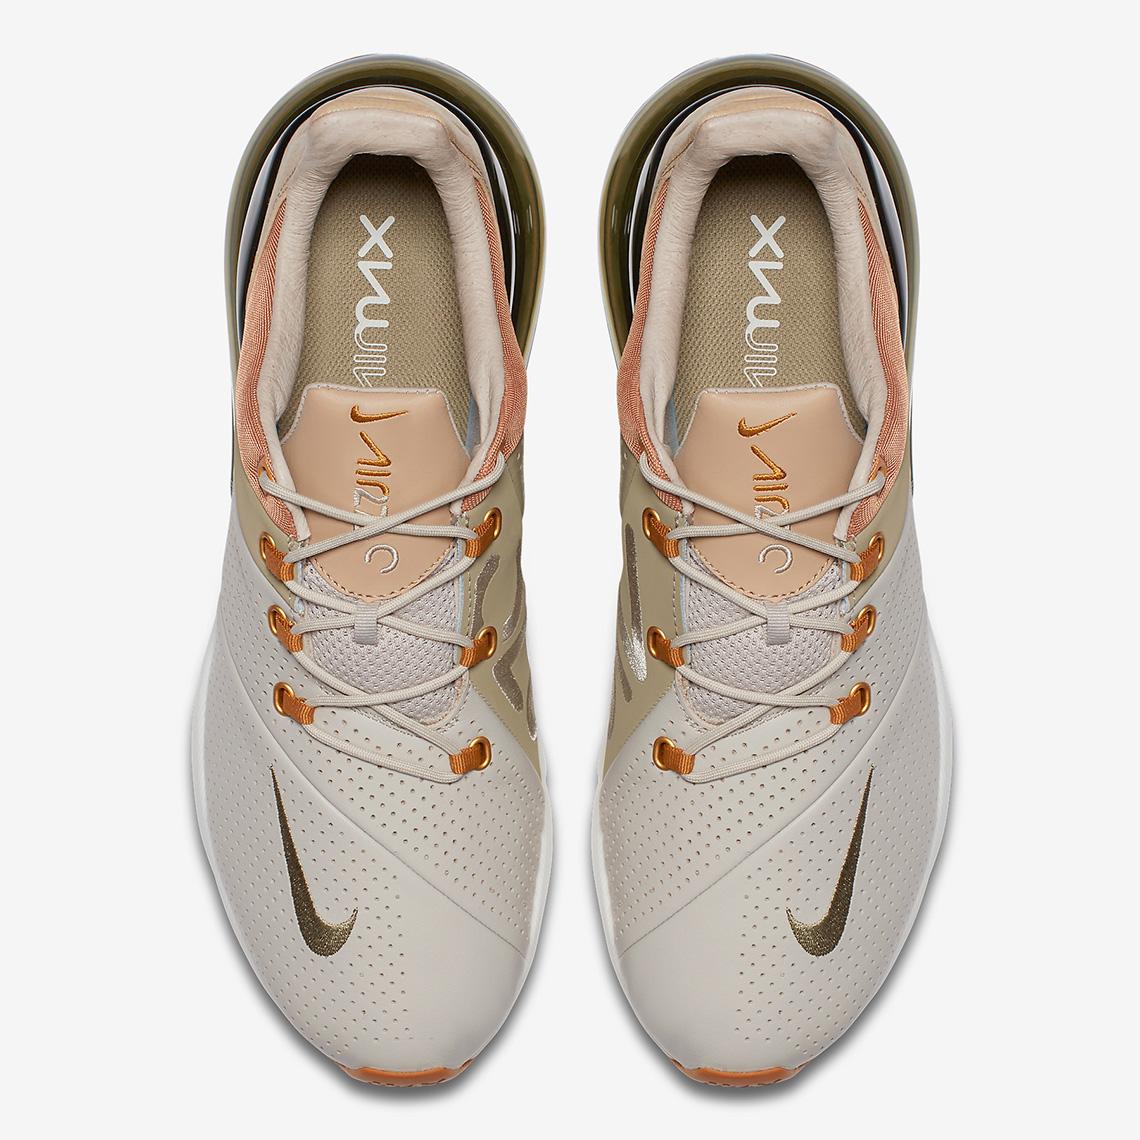 quality design 05f90 e84b1 Nike Air Max 270 Premium - First Look | SneakerNews.com